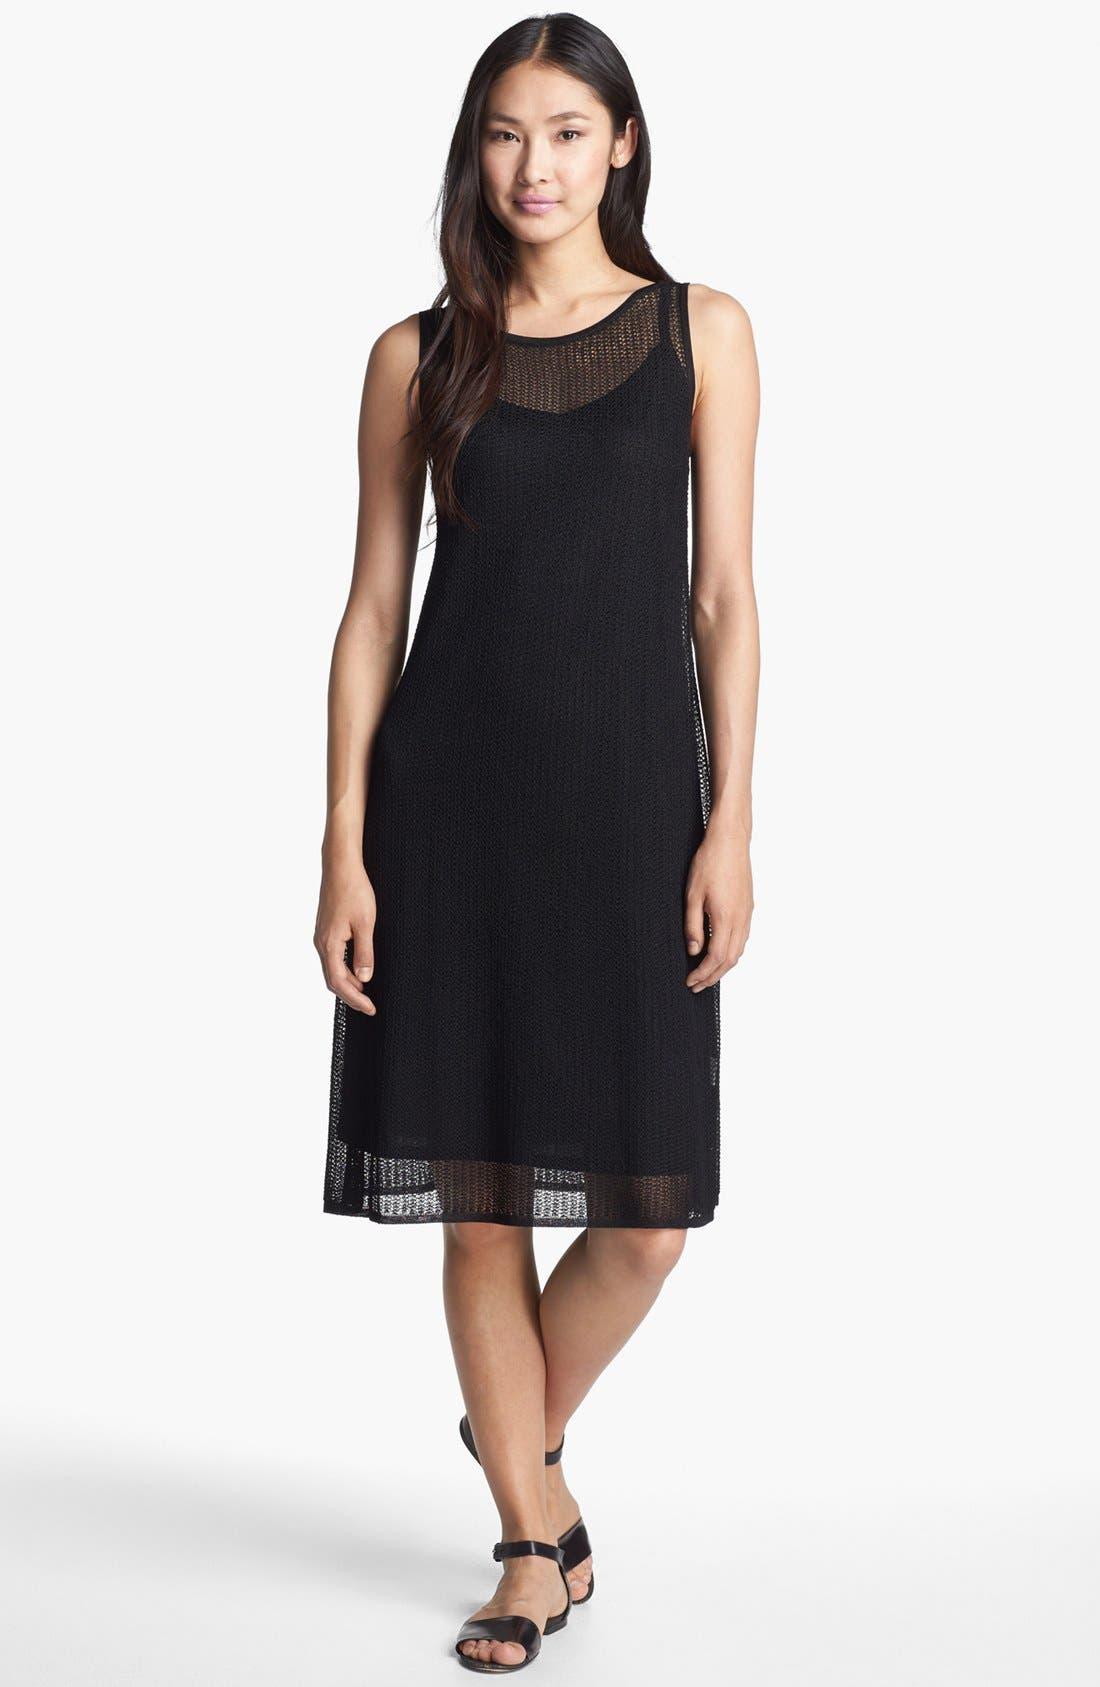 Alternate Image 1 Selected - Eileen Fisher Mesh Knit Dress